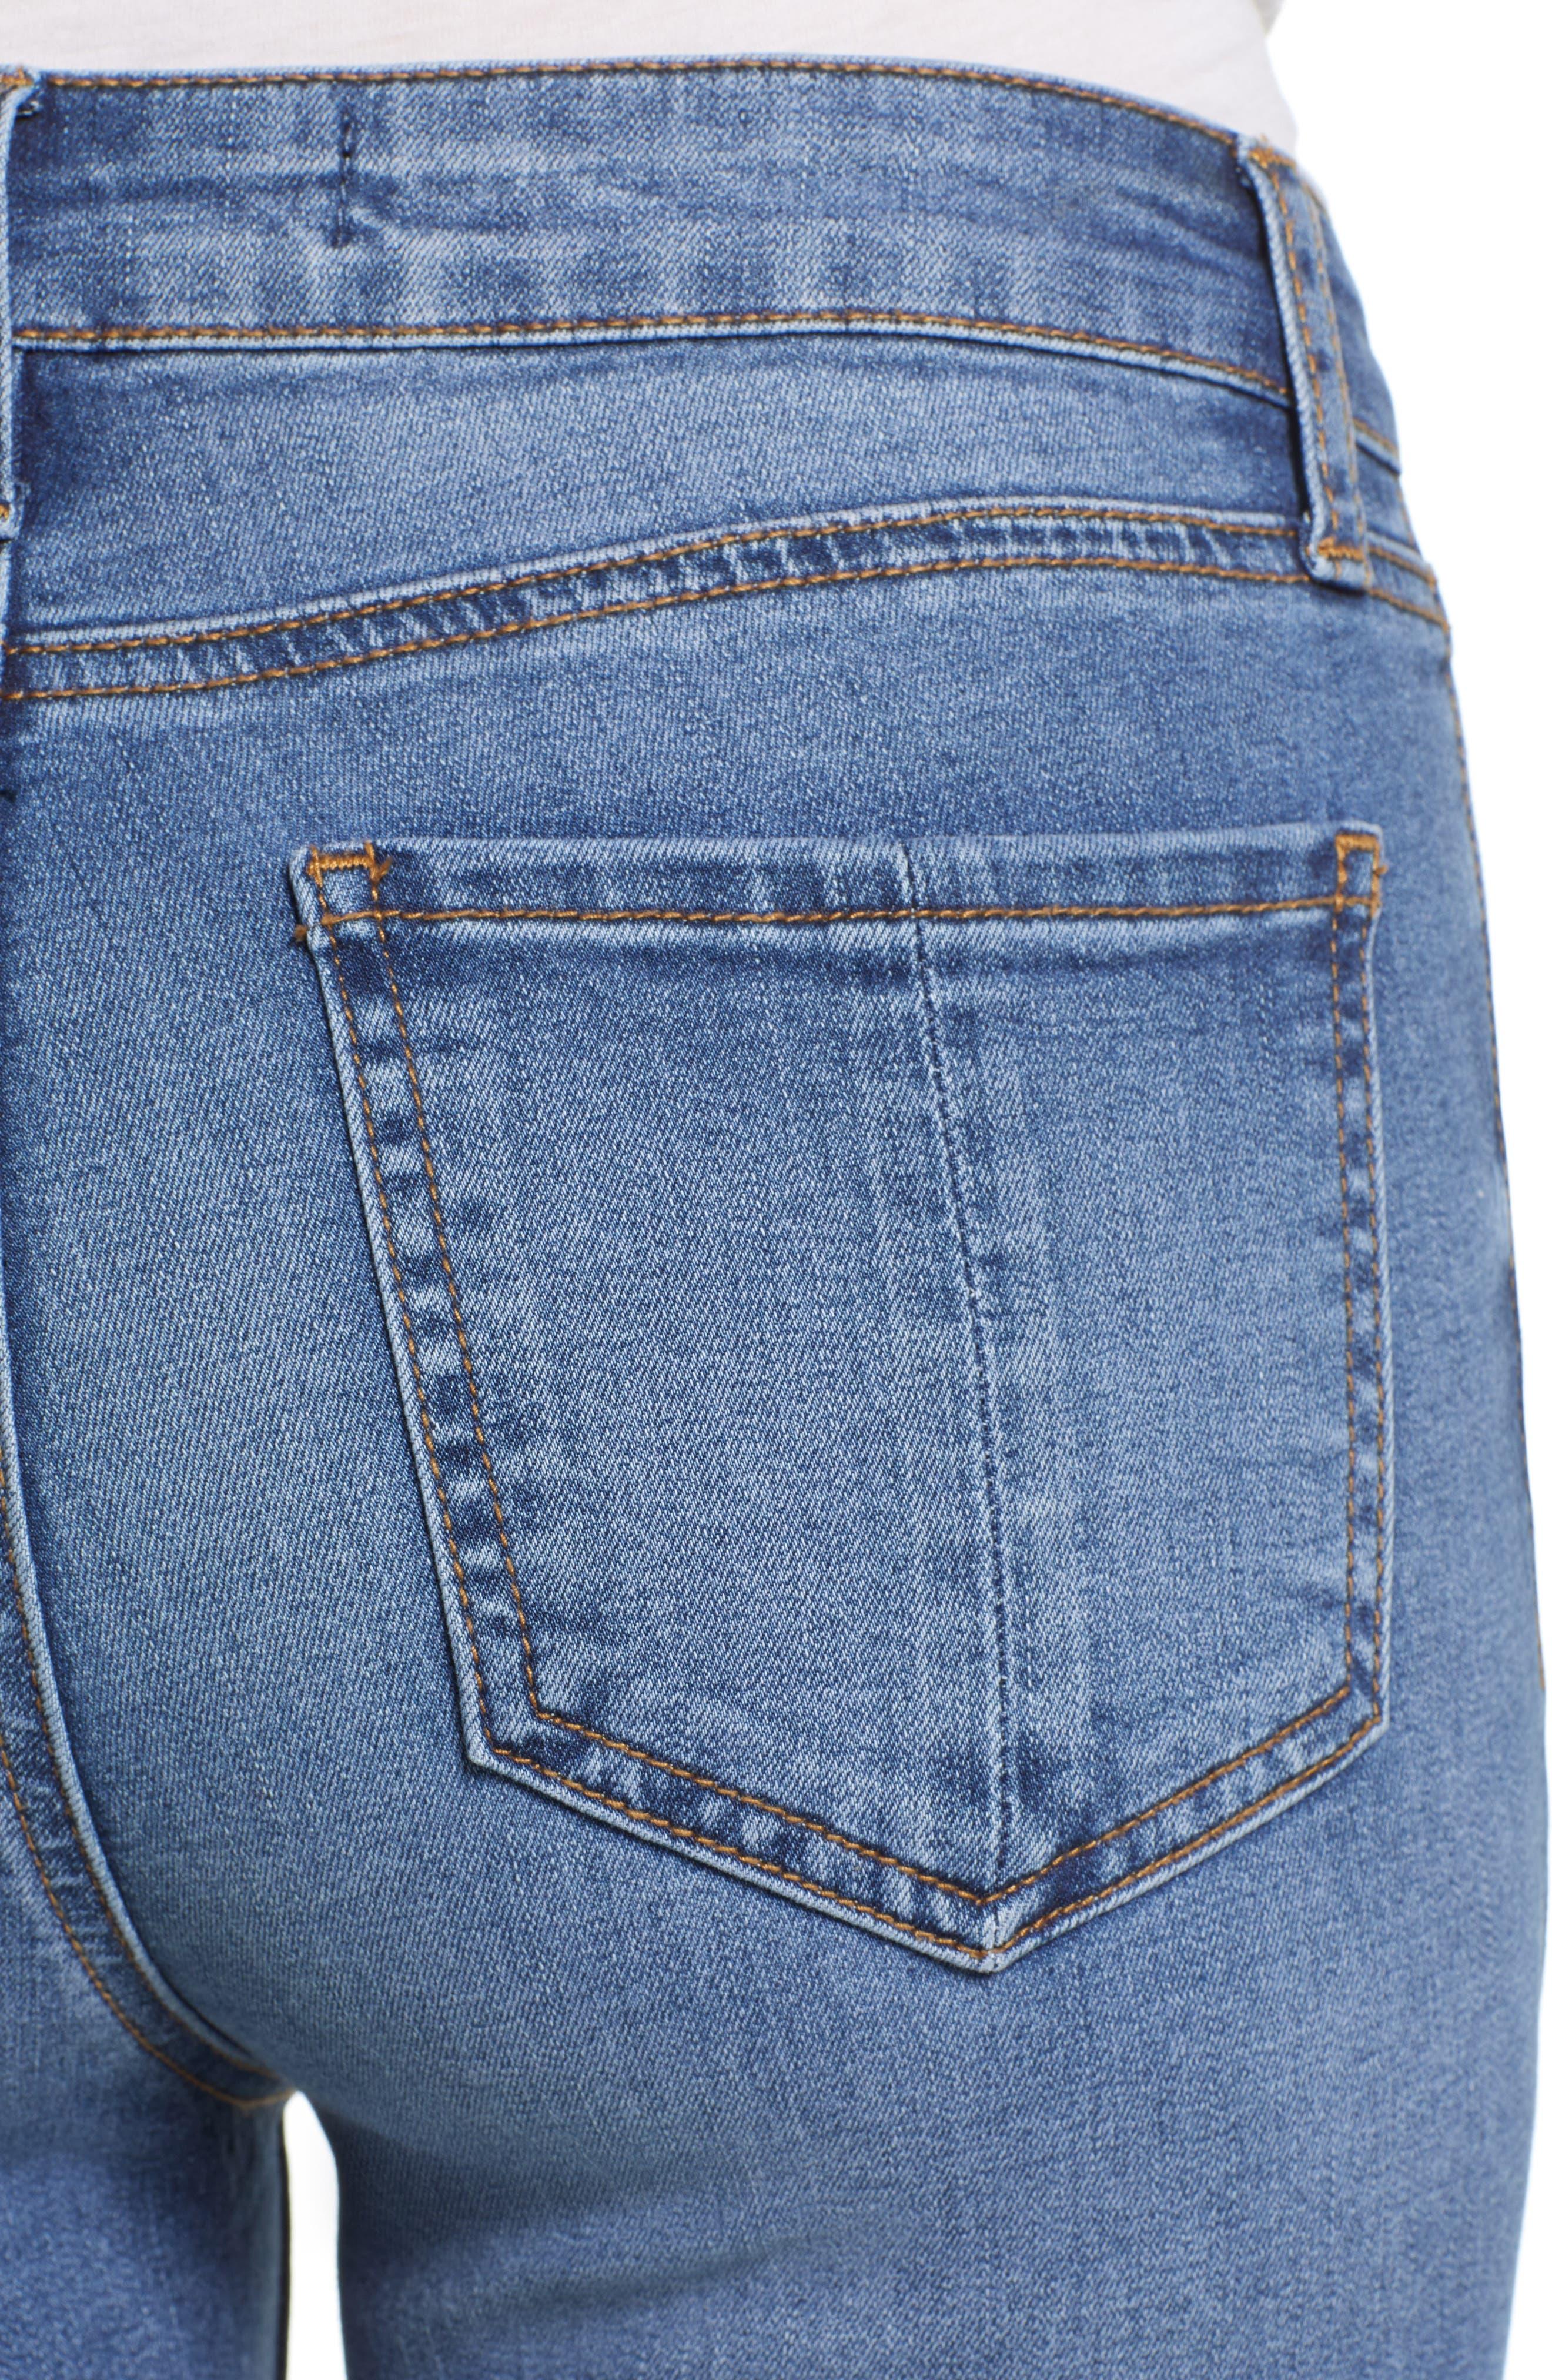 Crop Skinny Jeans,                             Alternate thumbnail 4, color,                             MEDIUM WASH